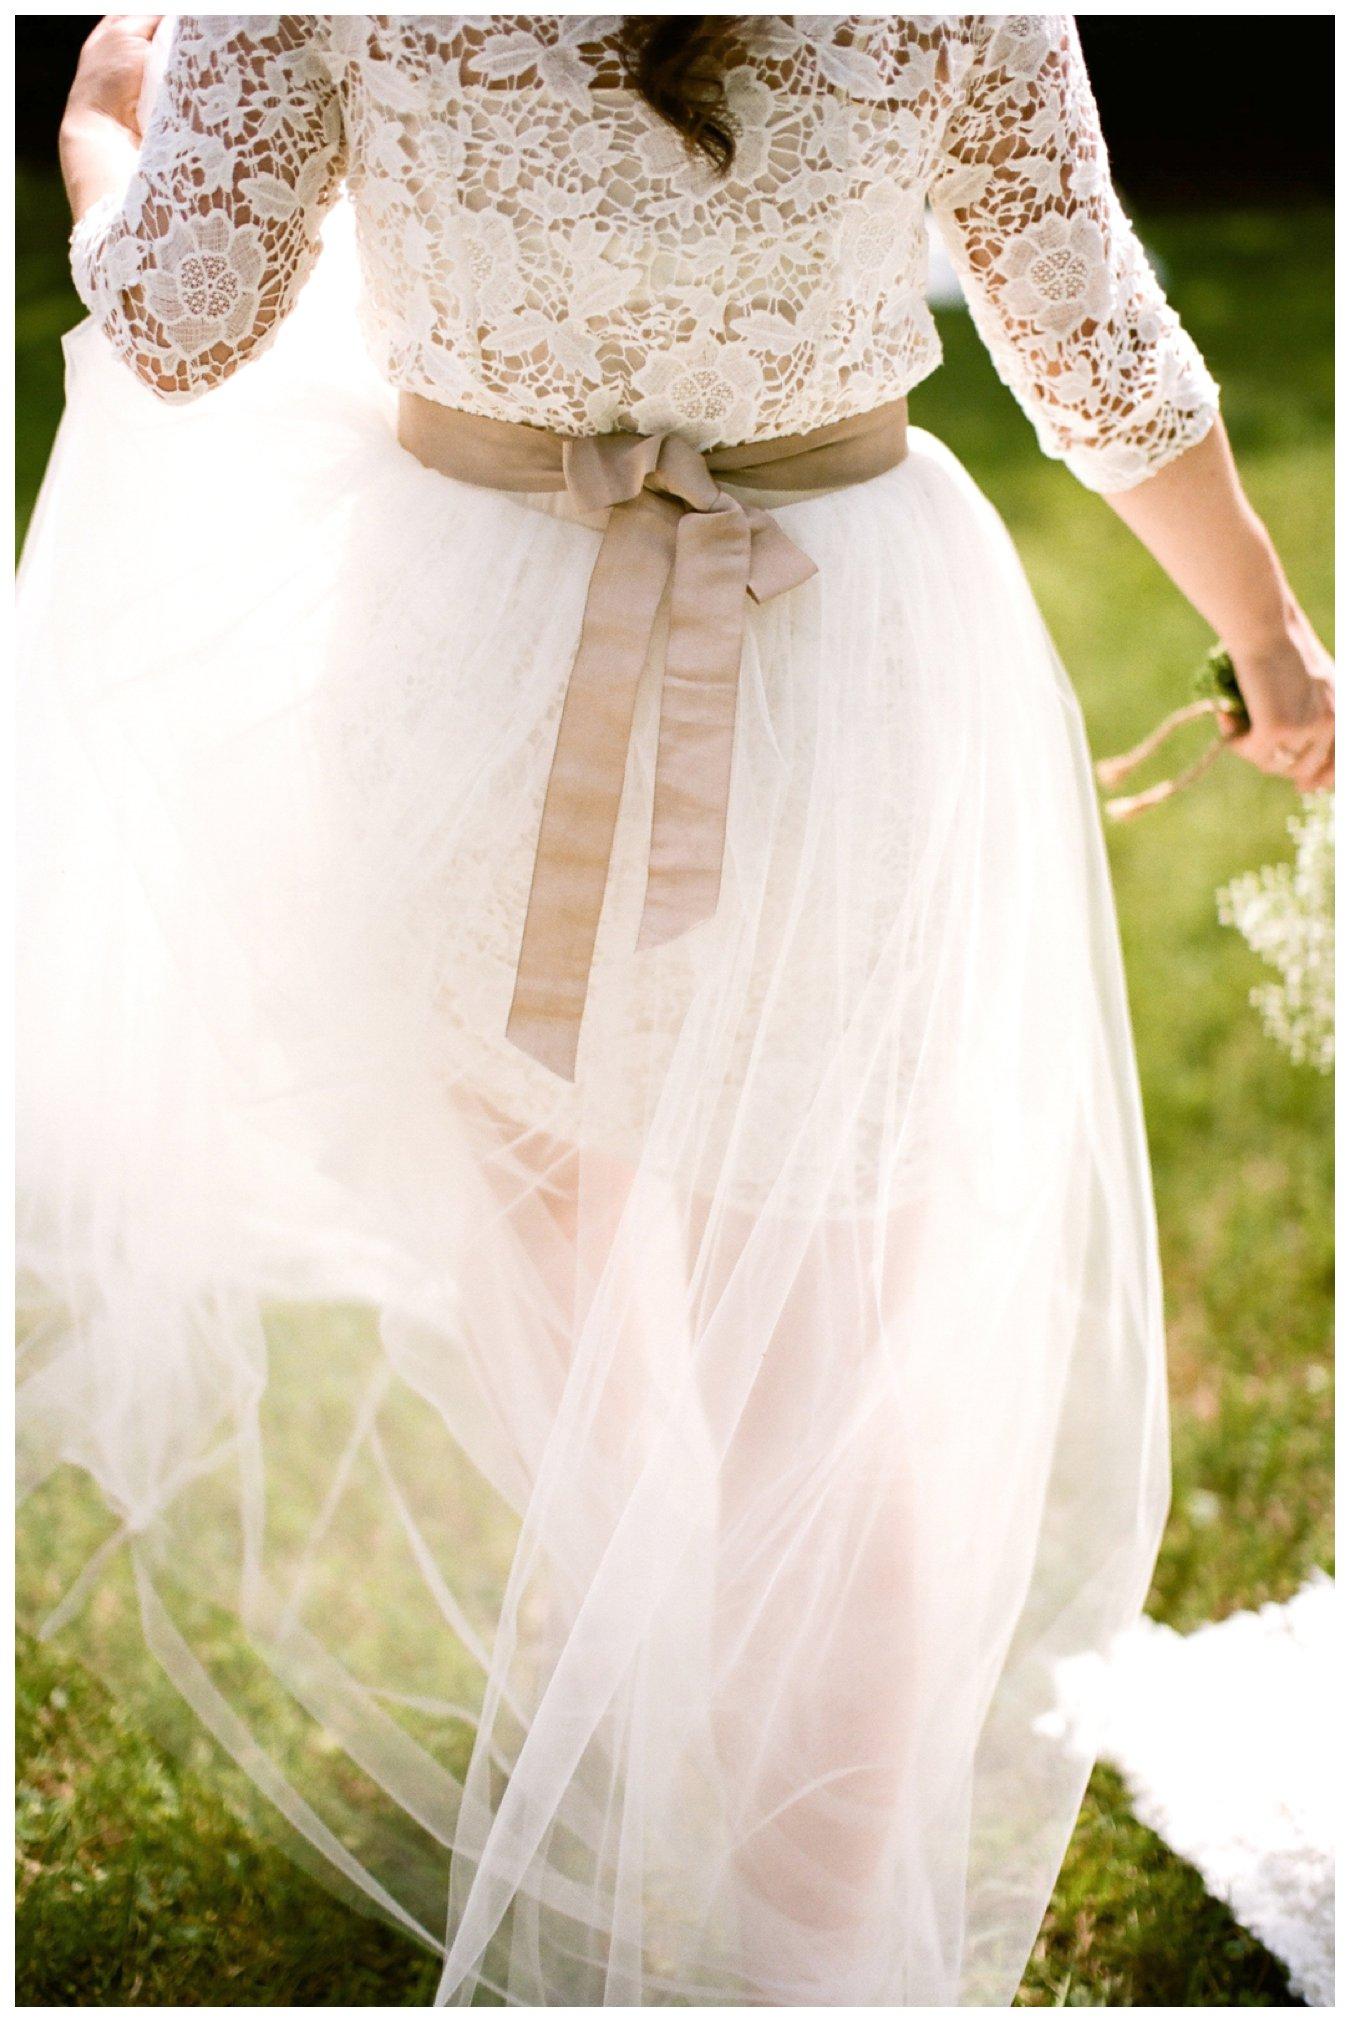 Fine Art Film wedding photographer Columbus Ohio Lily Glass Photography. Madewell Wedding dress, Otis James Bow-tie, first look